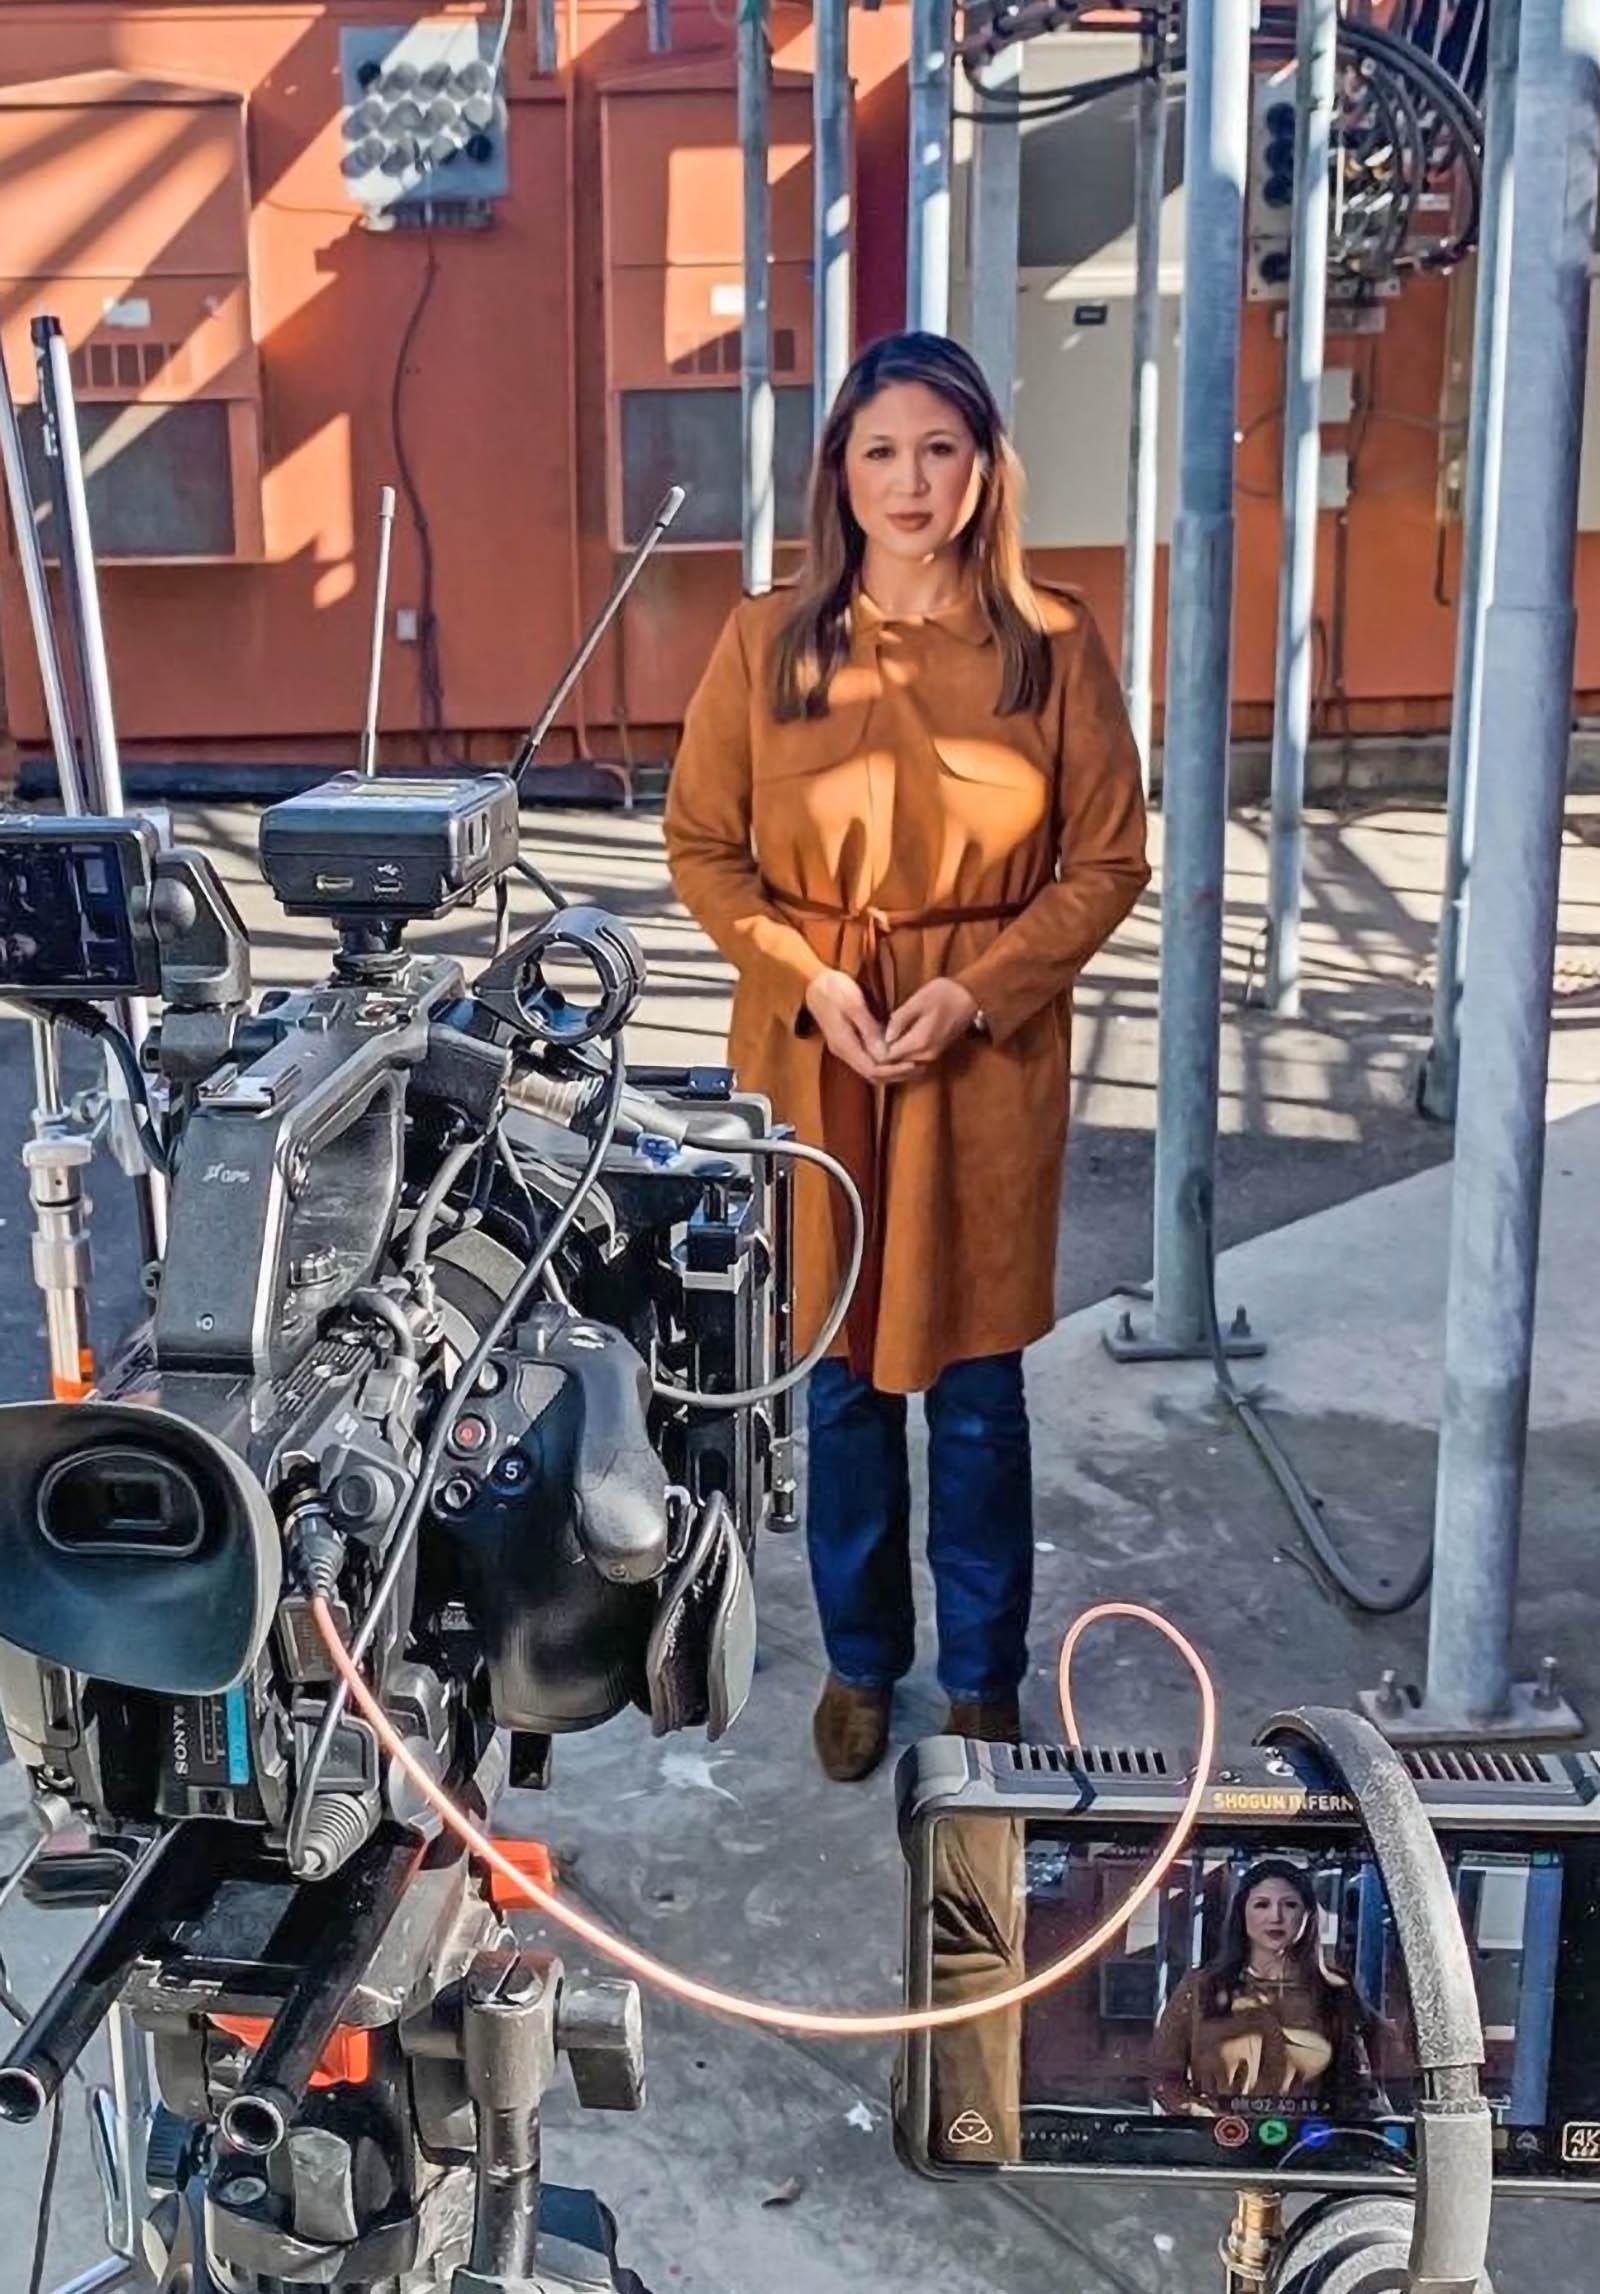 Ananda Rochita on live camera of ABC 10 News Sacramento